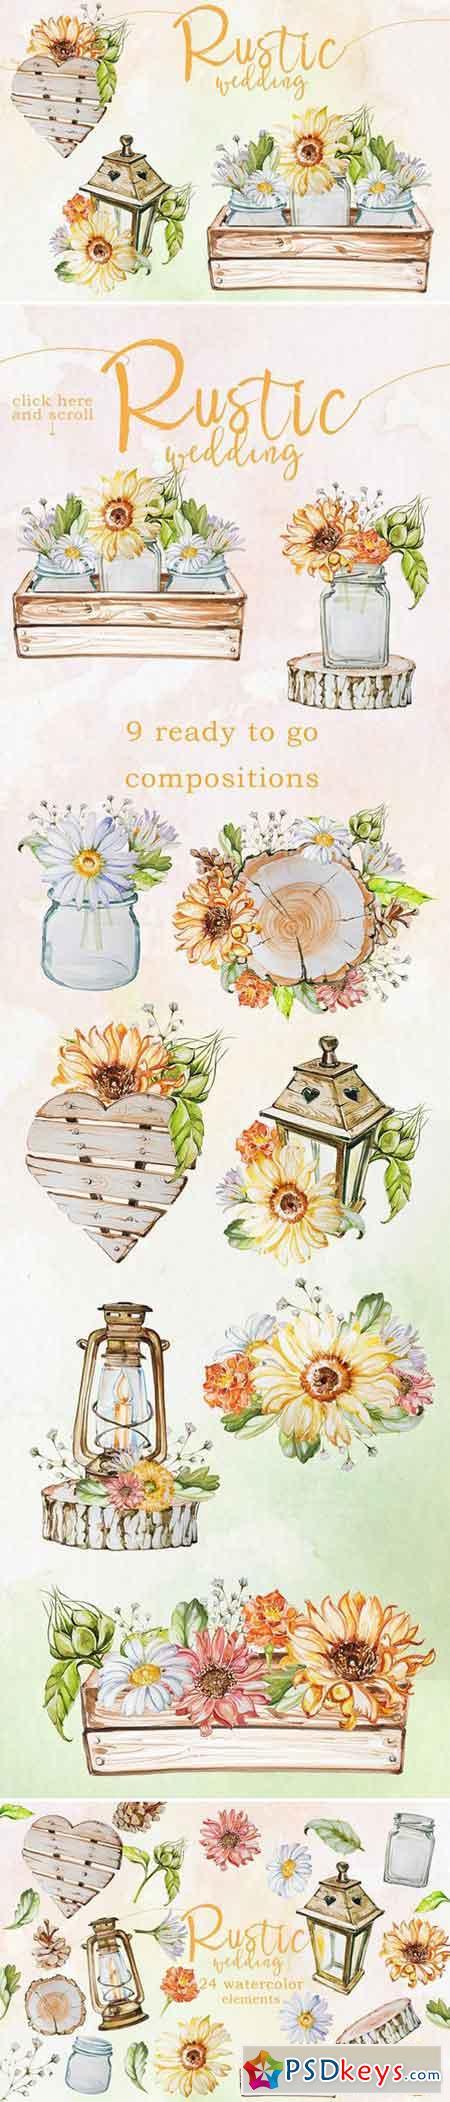 Watercolor Rustic Wedding Clipart 2403057